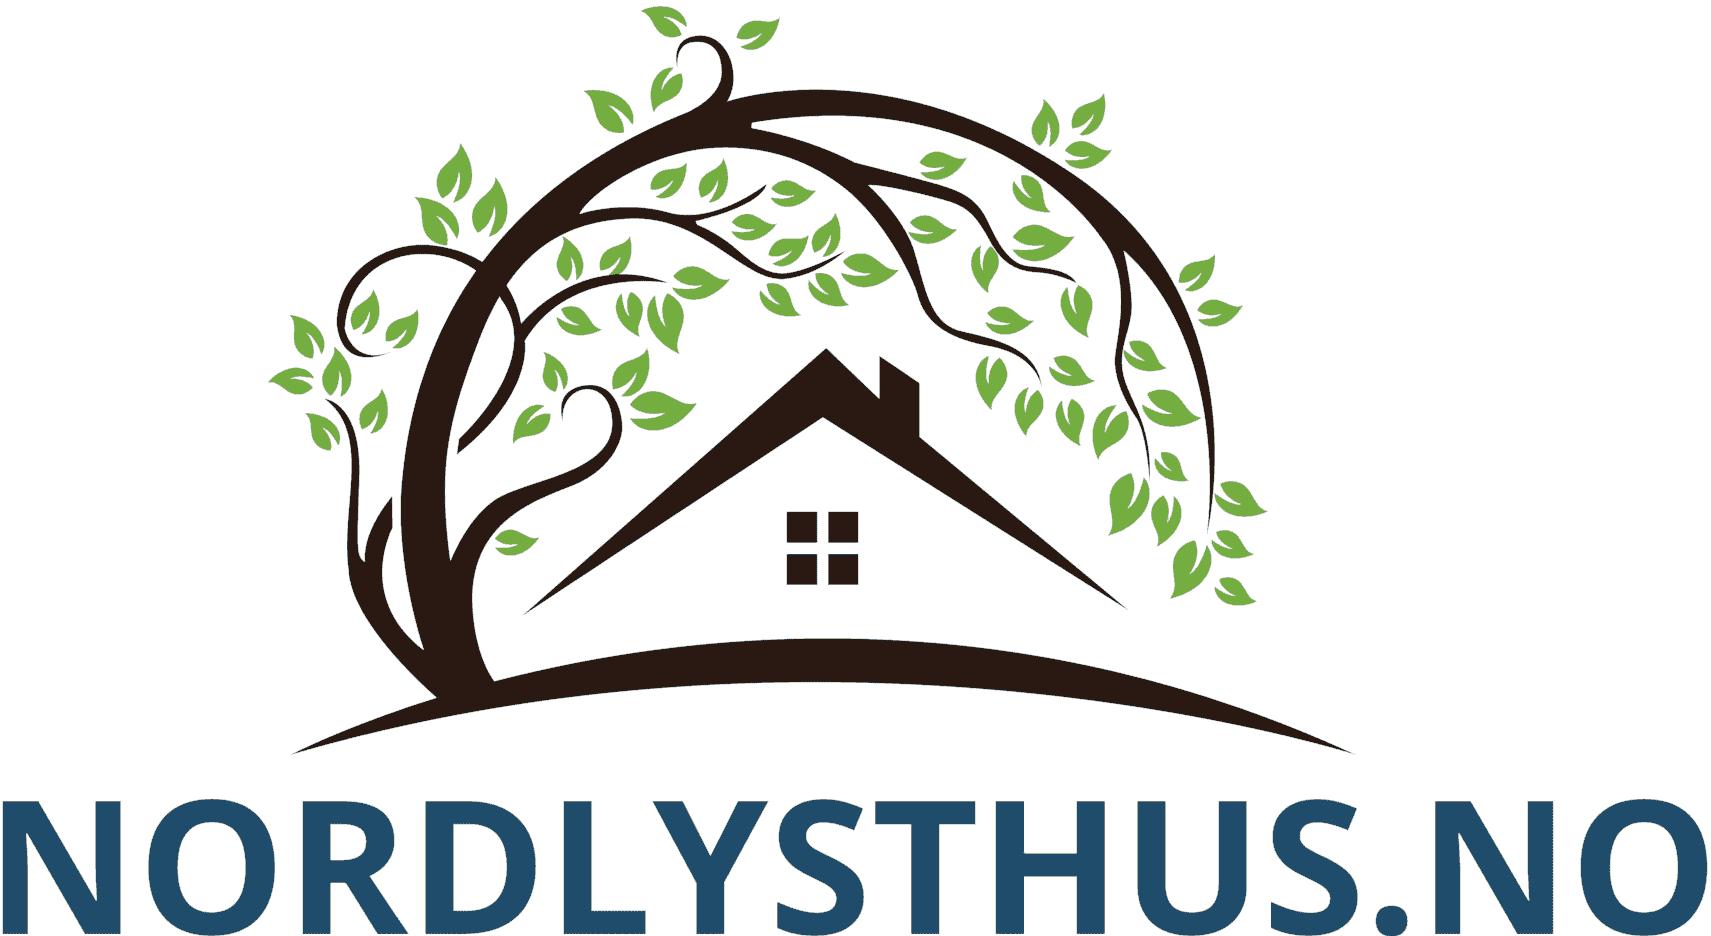 Nordlysthus